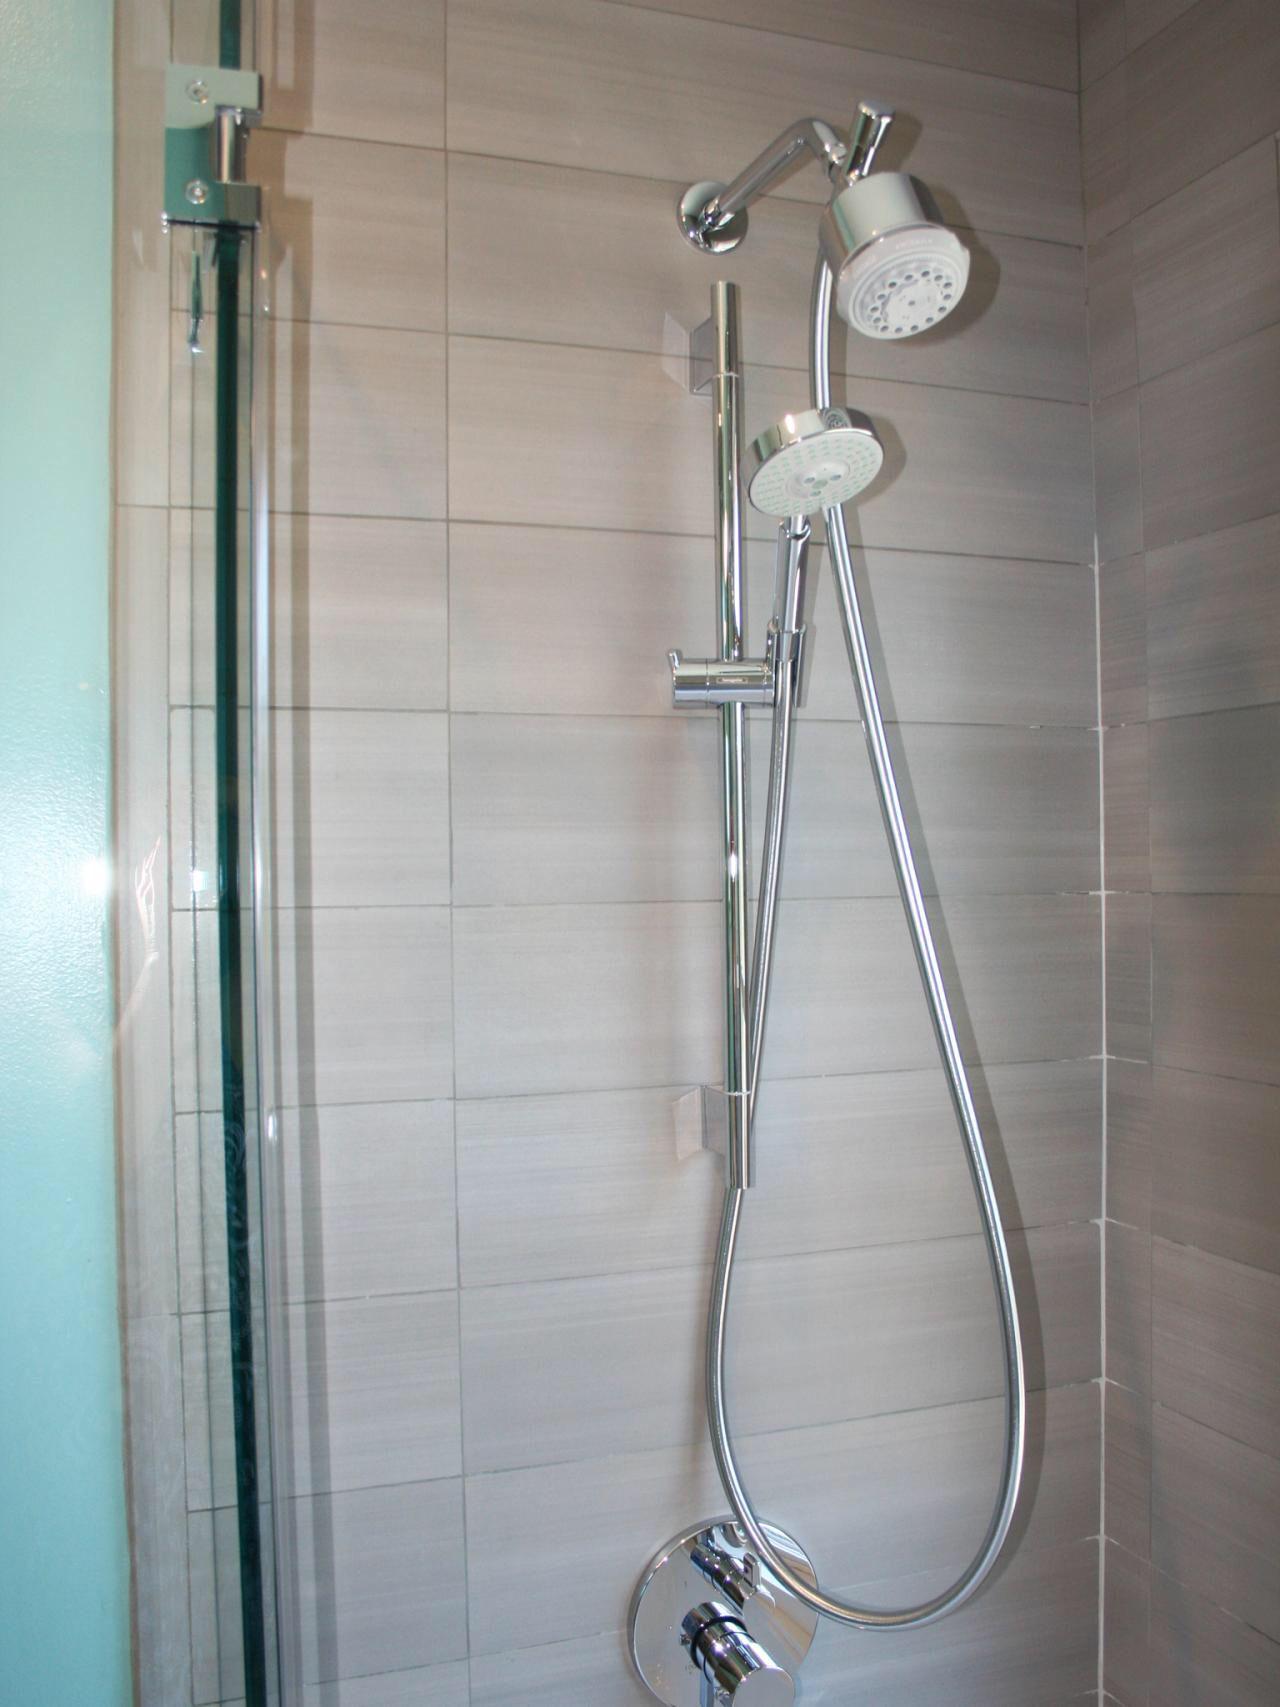 Tile for Mallory's bath